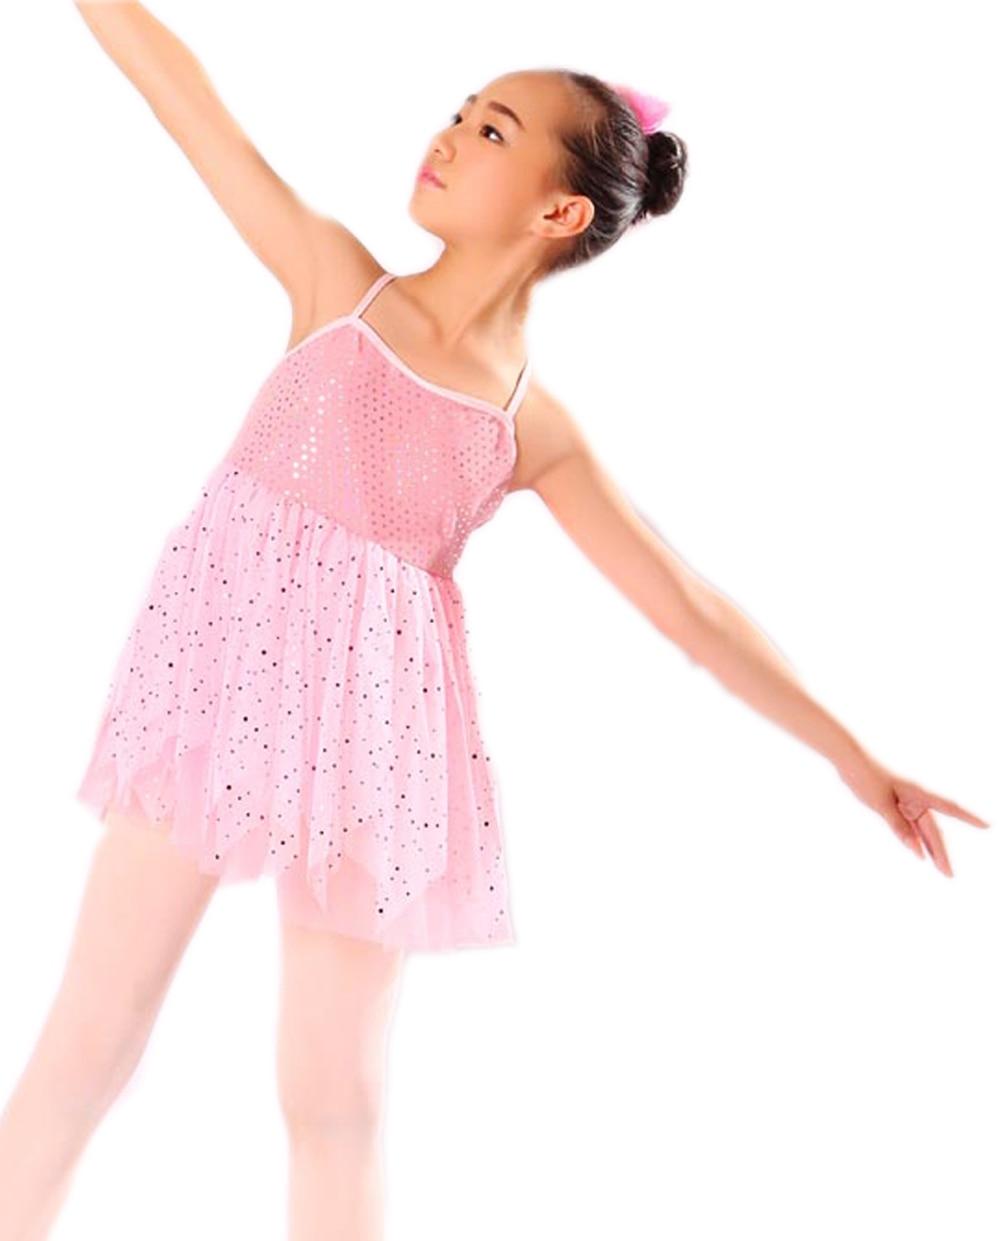 Tutu Danse Classique Adulte Ballett Professionaalsed balleti kostüümid Balleriinid kleit lastele tütarlapsele